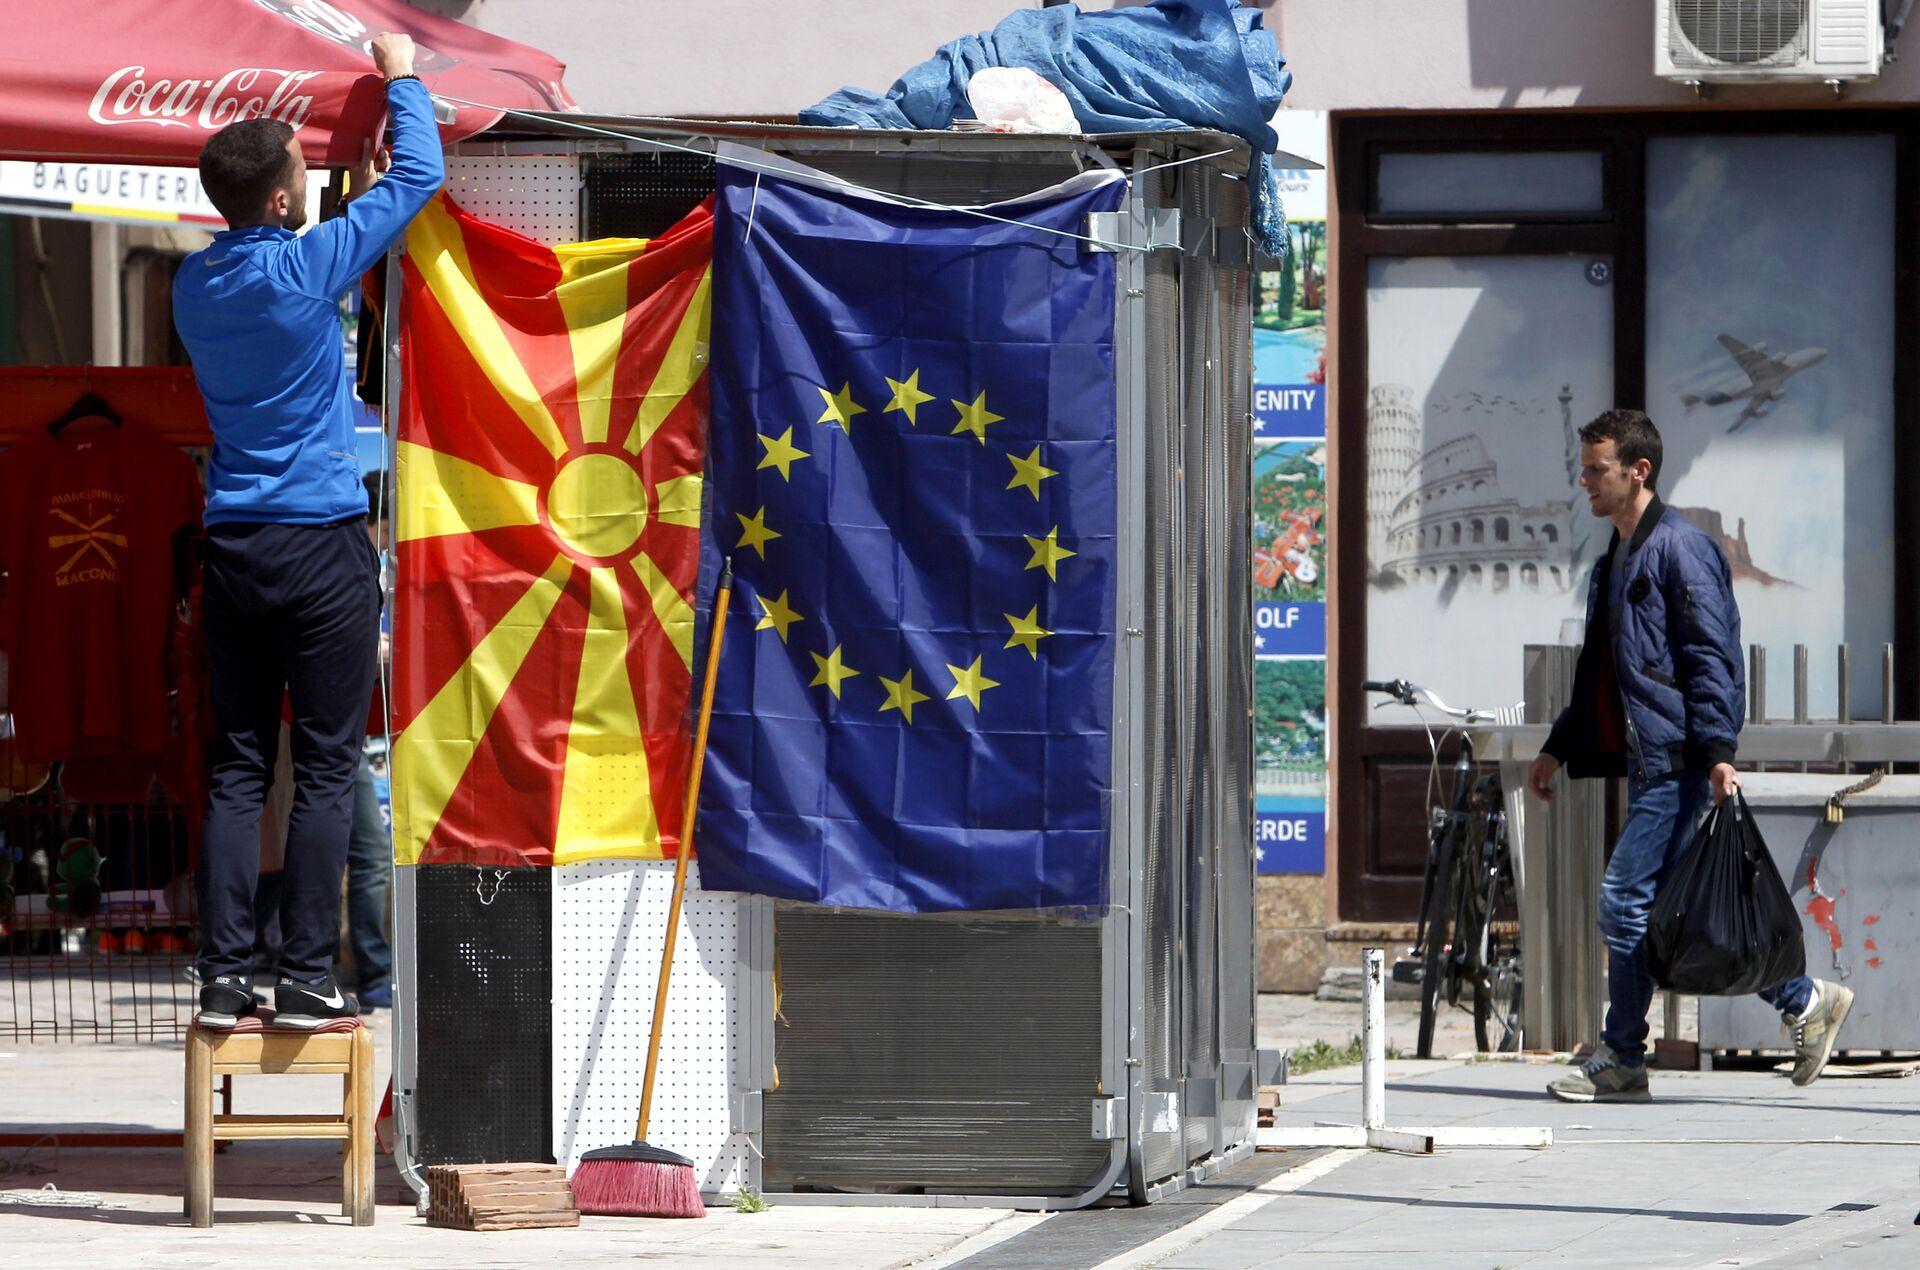 A street vendor fixes a North Macedonia flag next to an EU flag in a street in Skopje - Sputnik International, 1920, 07.09.2021